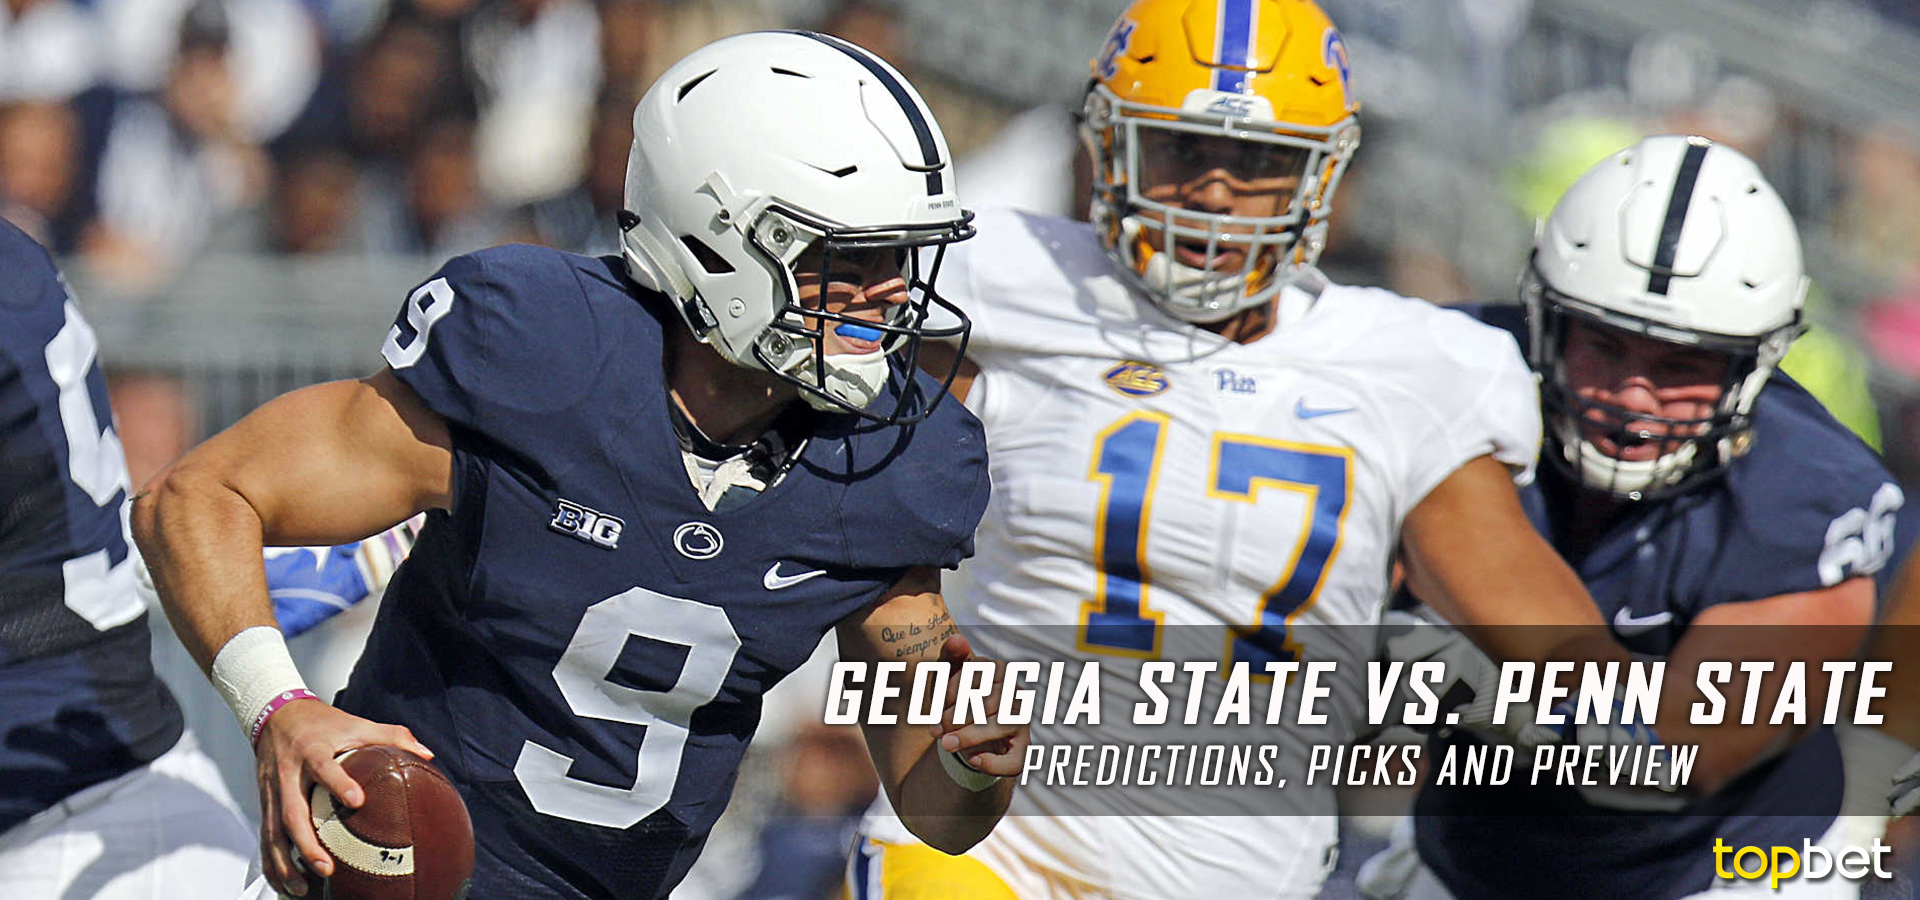 Georgia State vs Penn State Football Predictions, Picks & Odds